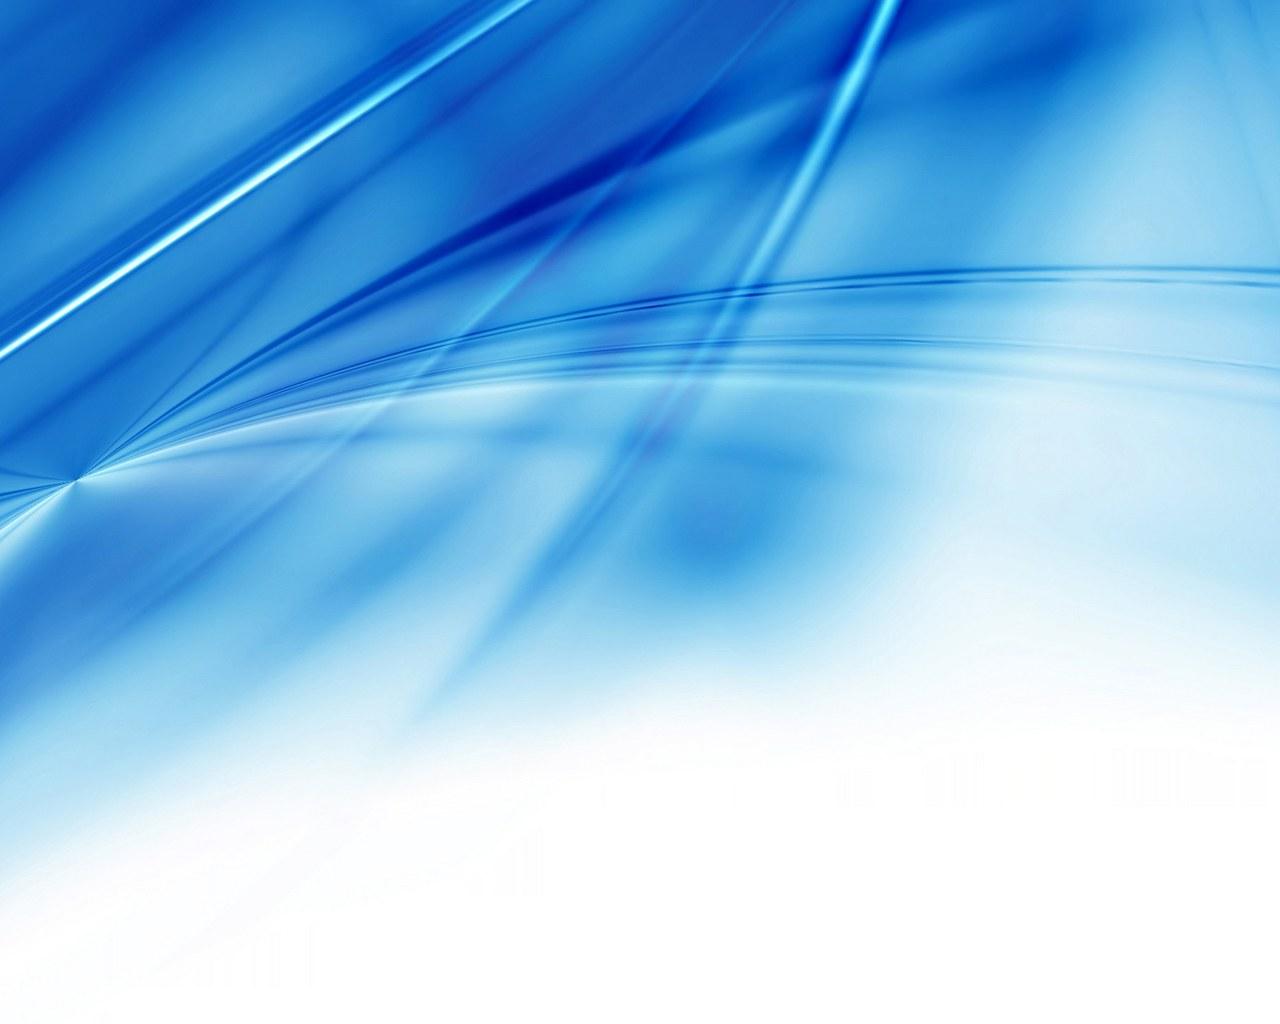 blue-background-wallpaper-13